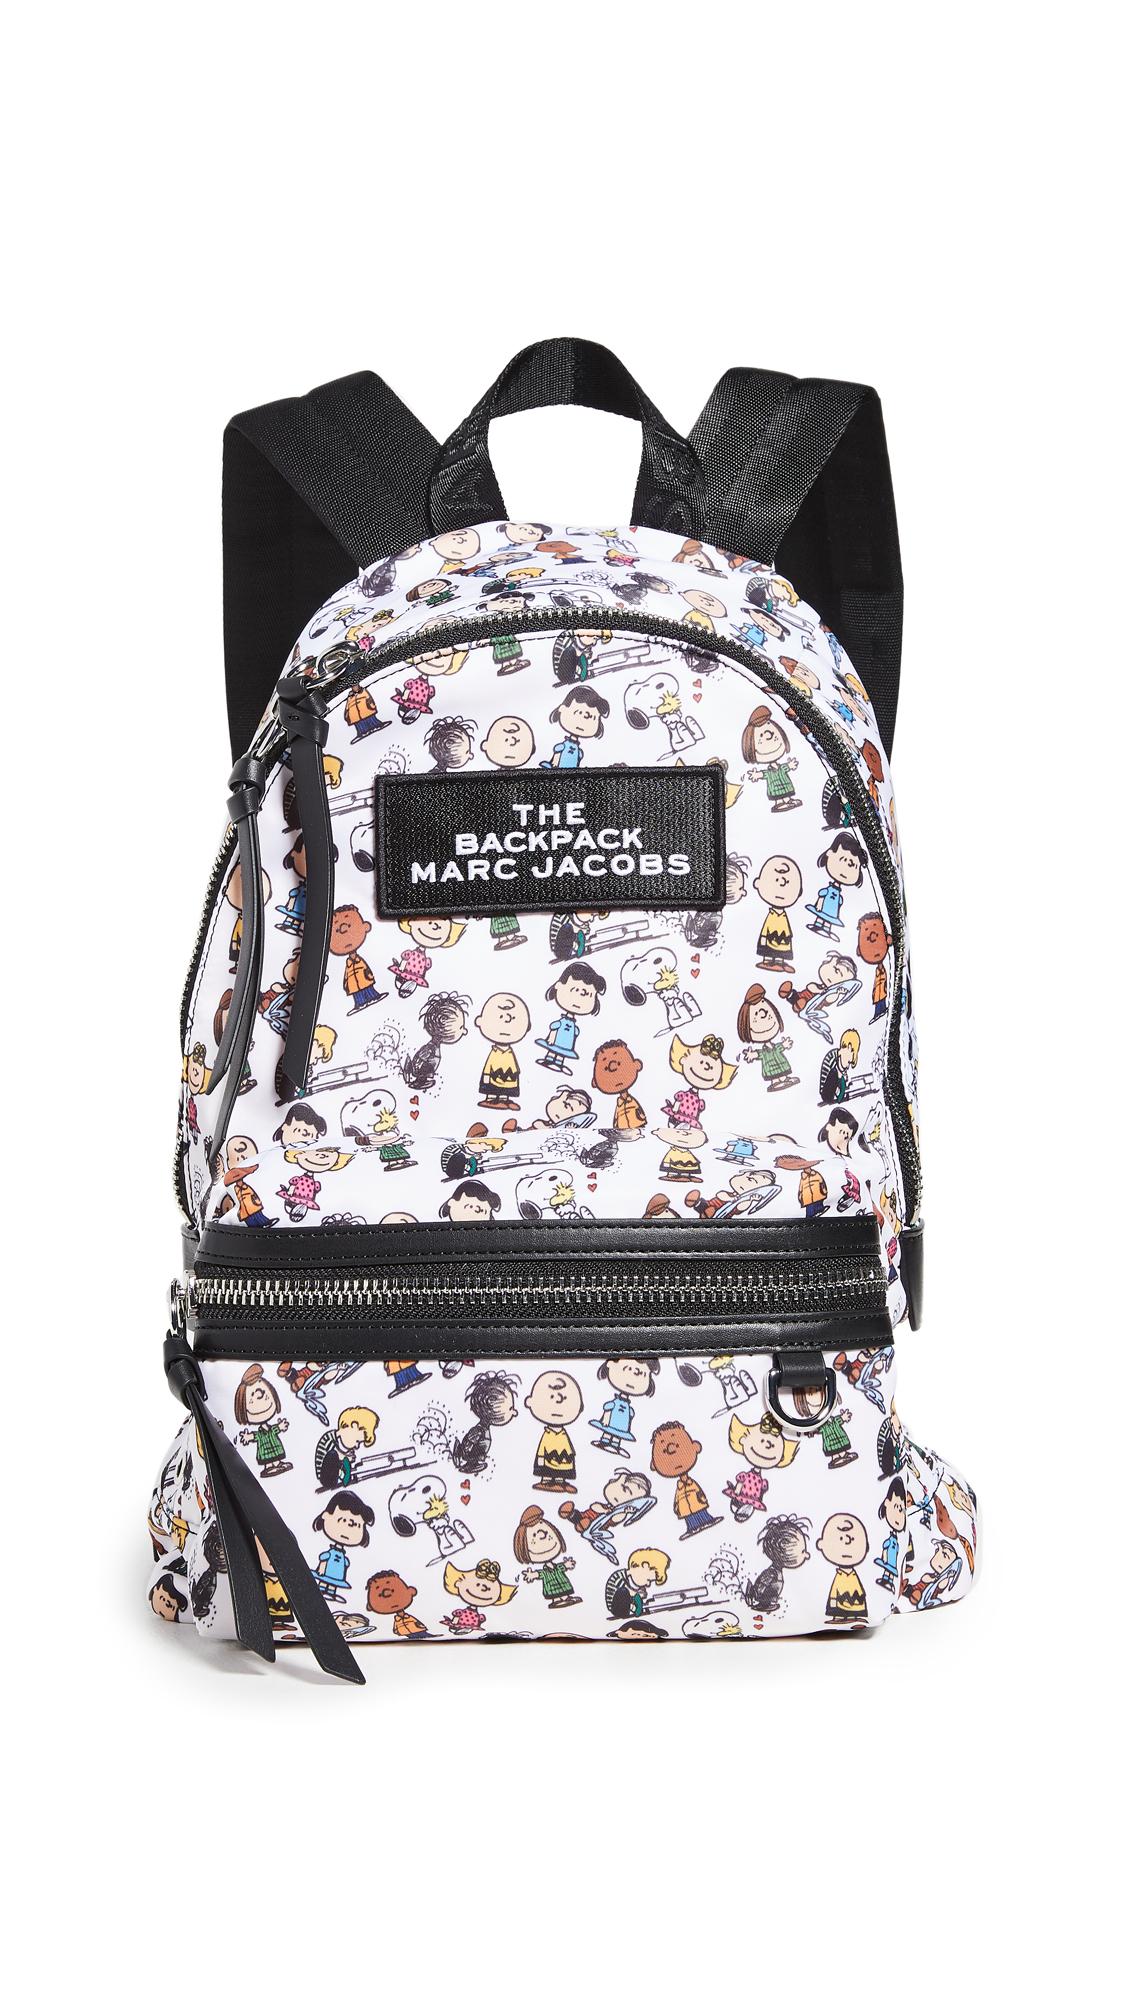 The Marc Jacobs x Peanuts Medium Backpack